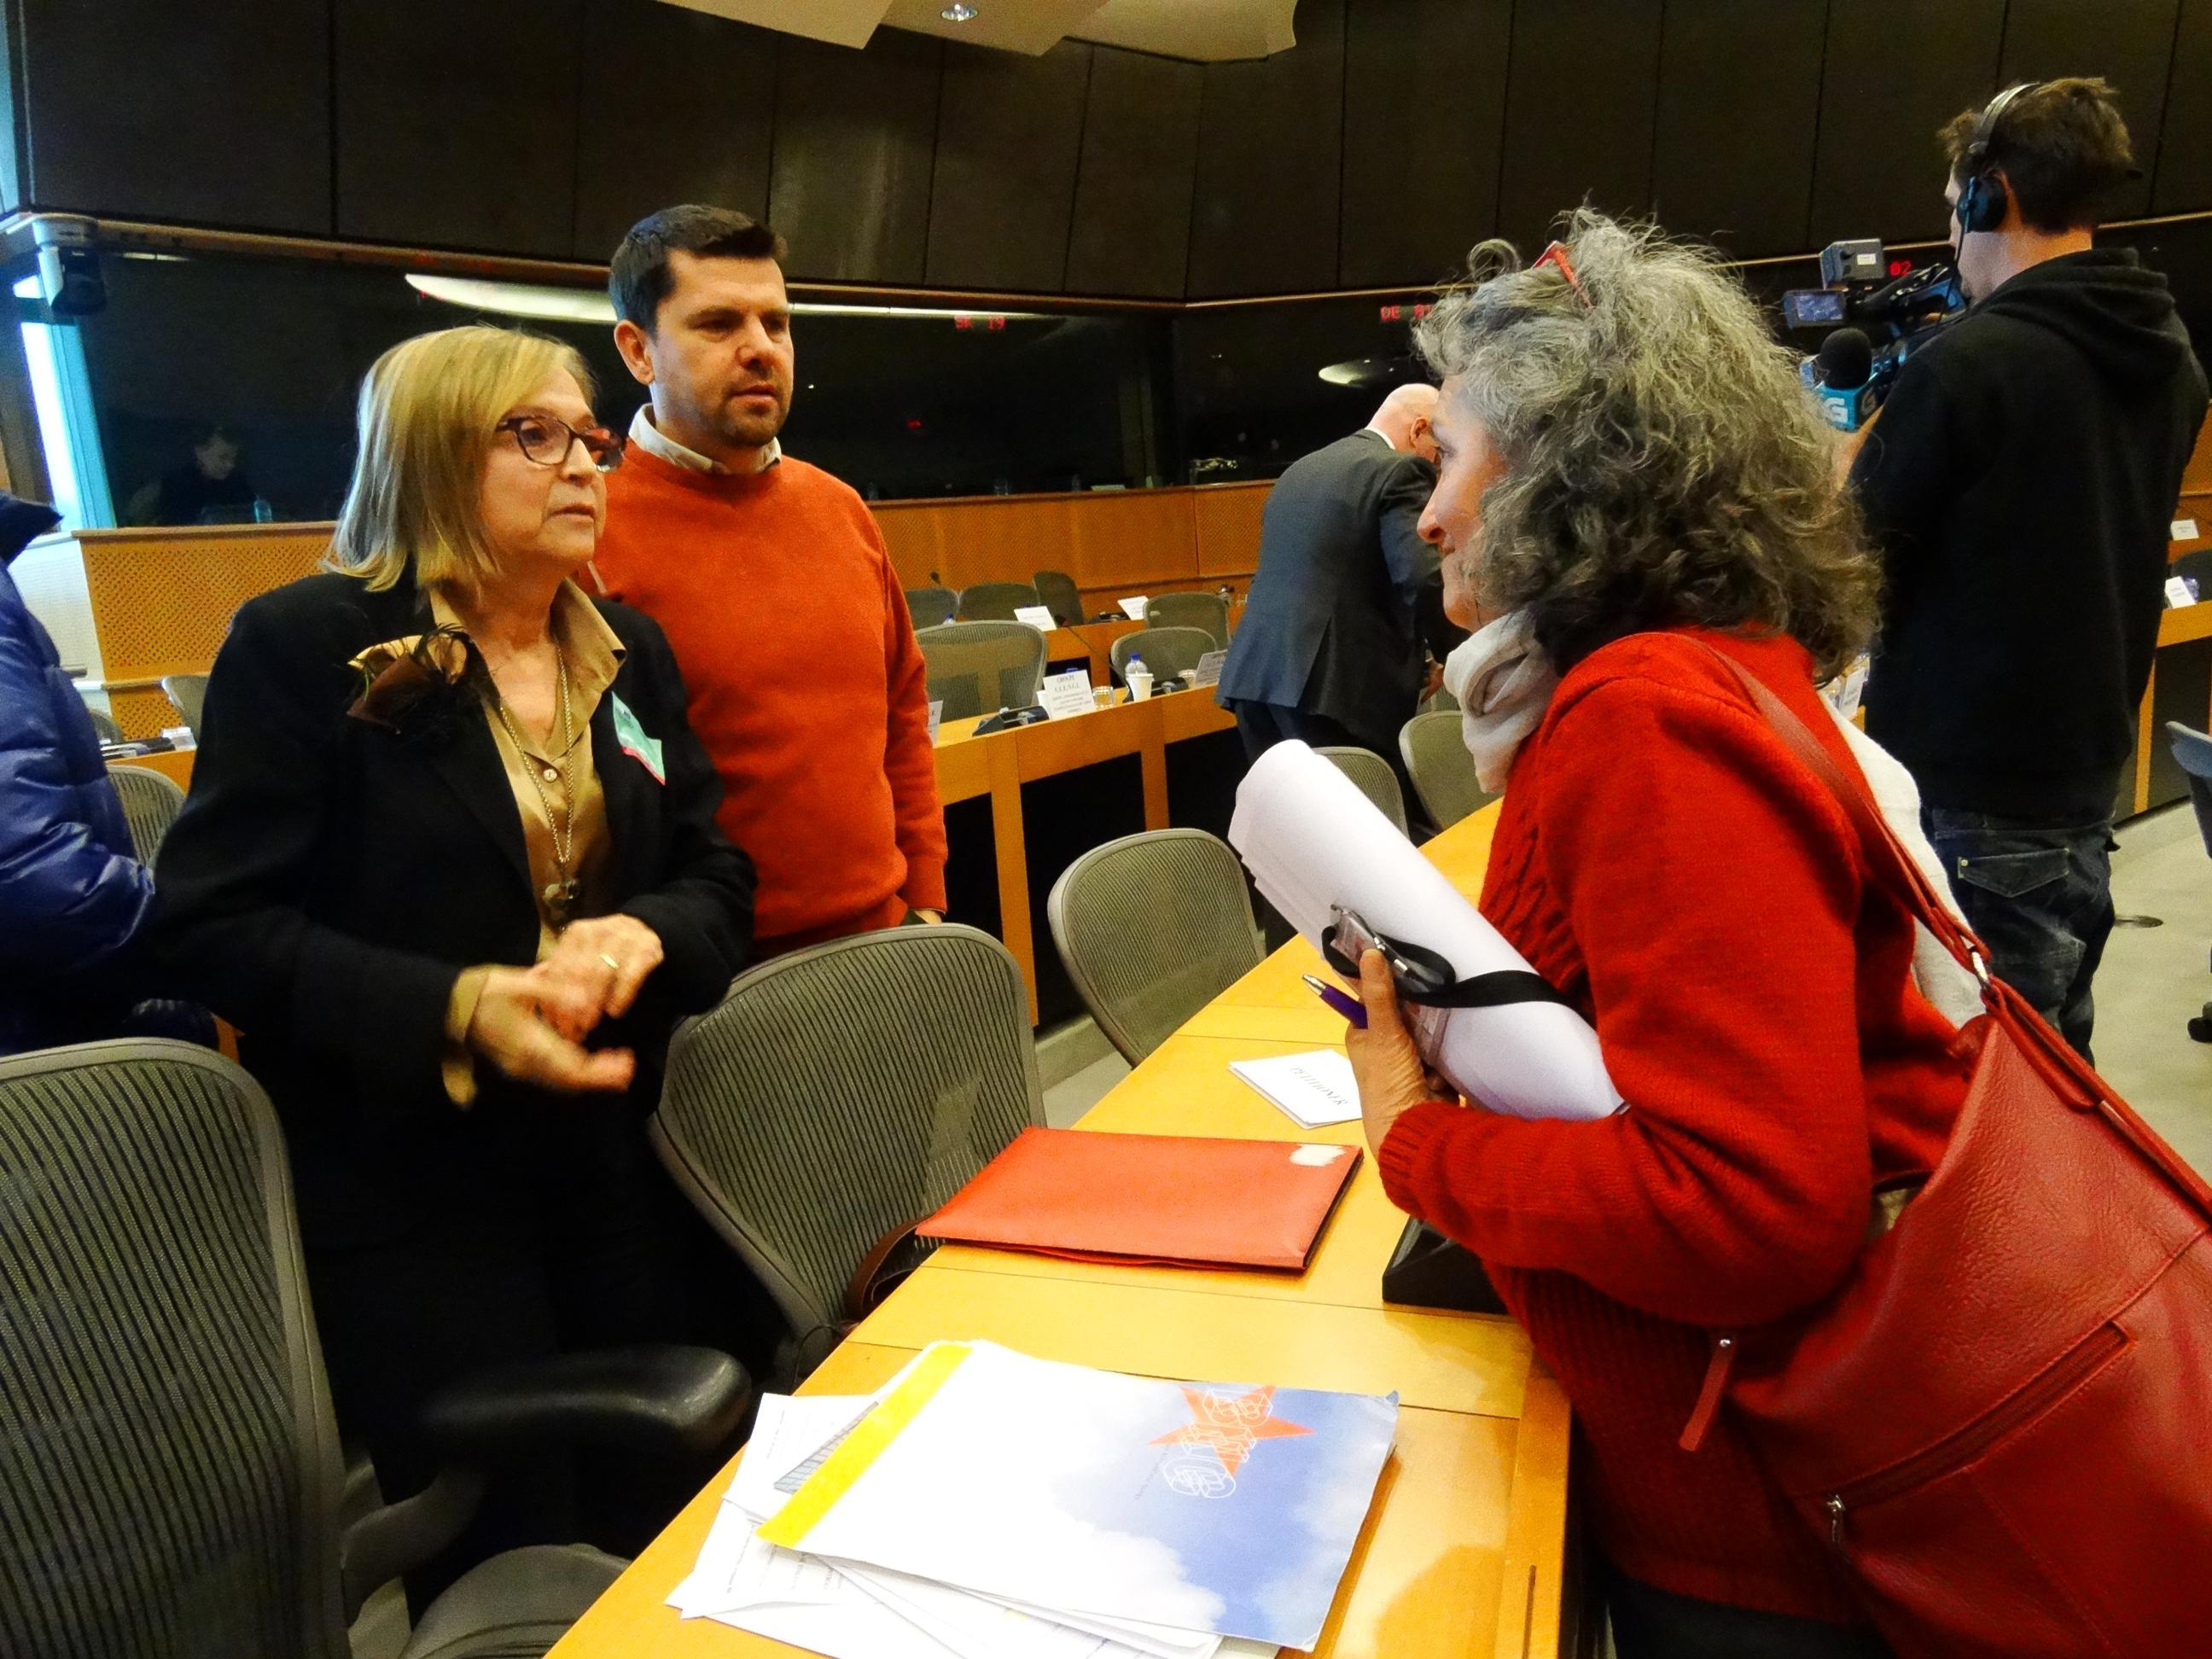 Lidia Senra, falando coas vítimas do accidente de Angrois no Parlamento Europeo 240117_2592x1944